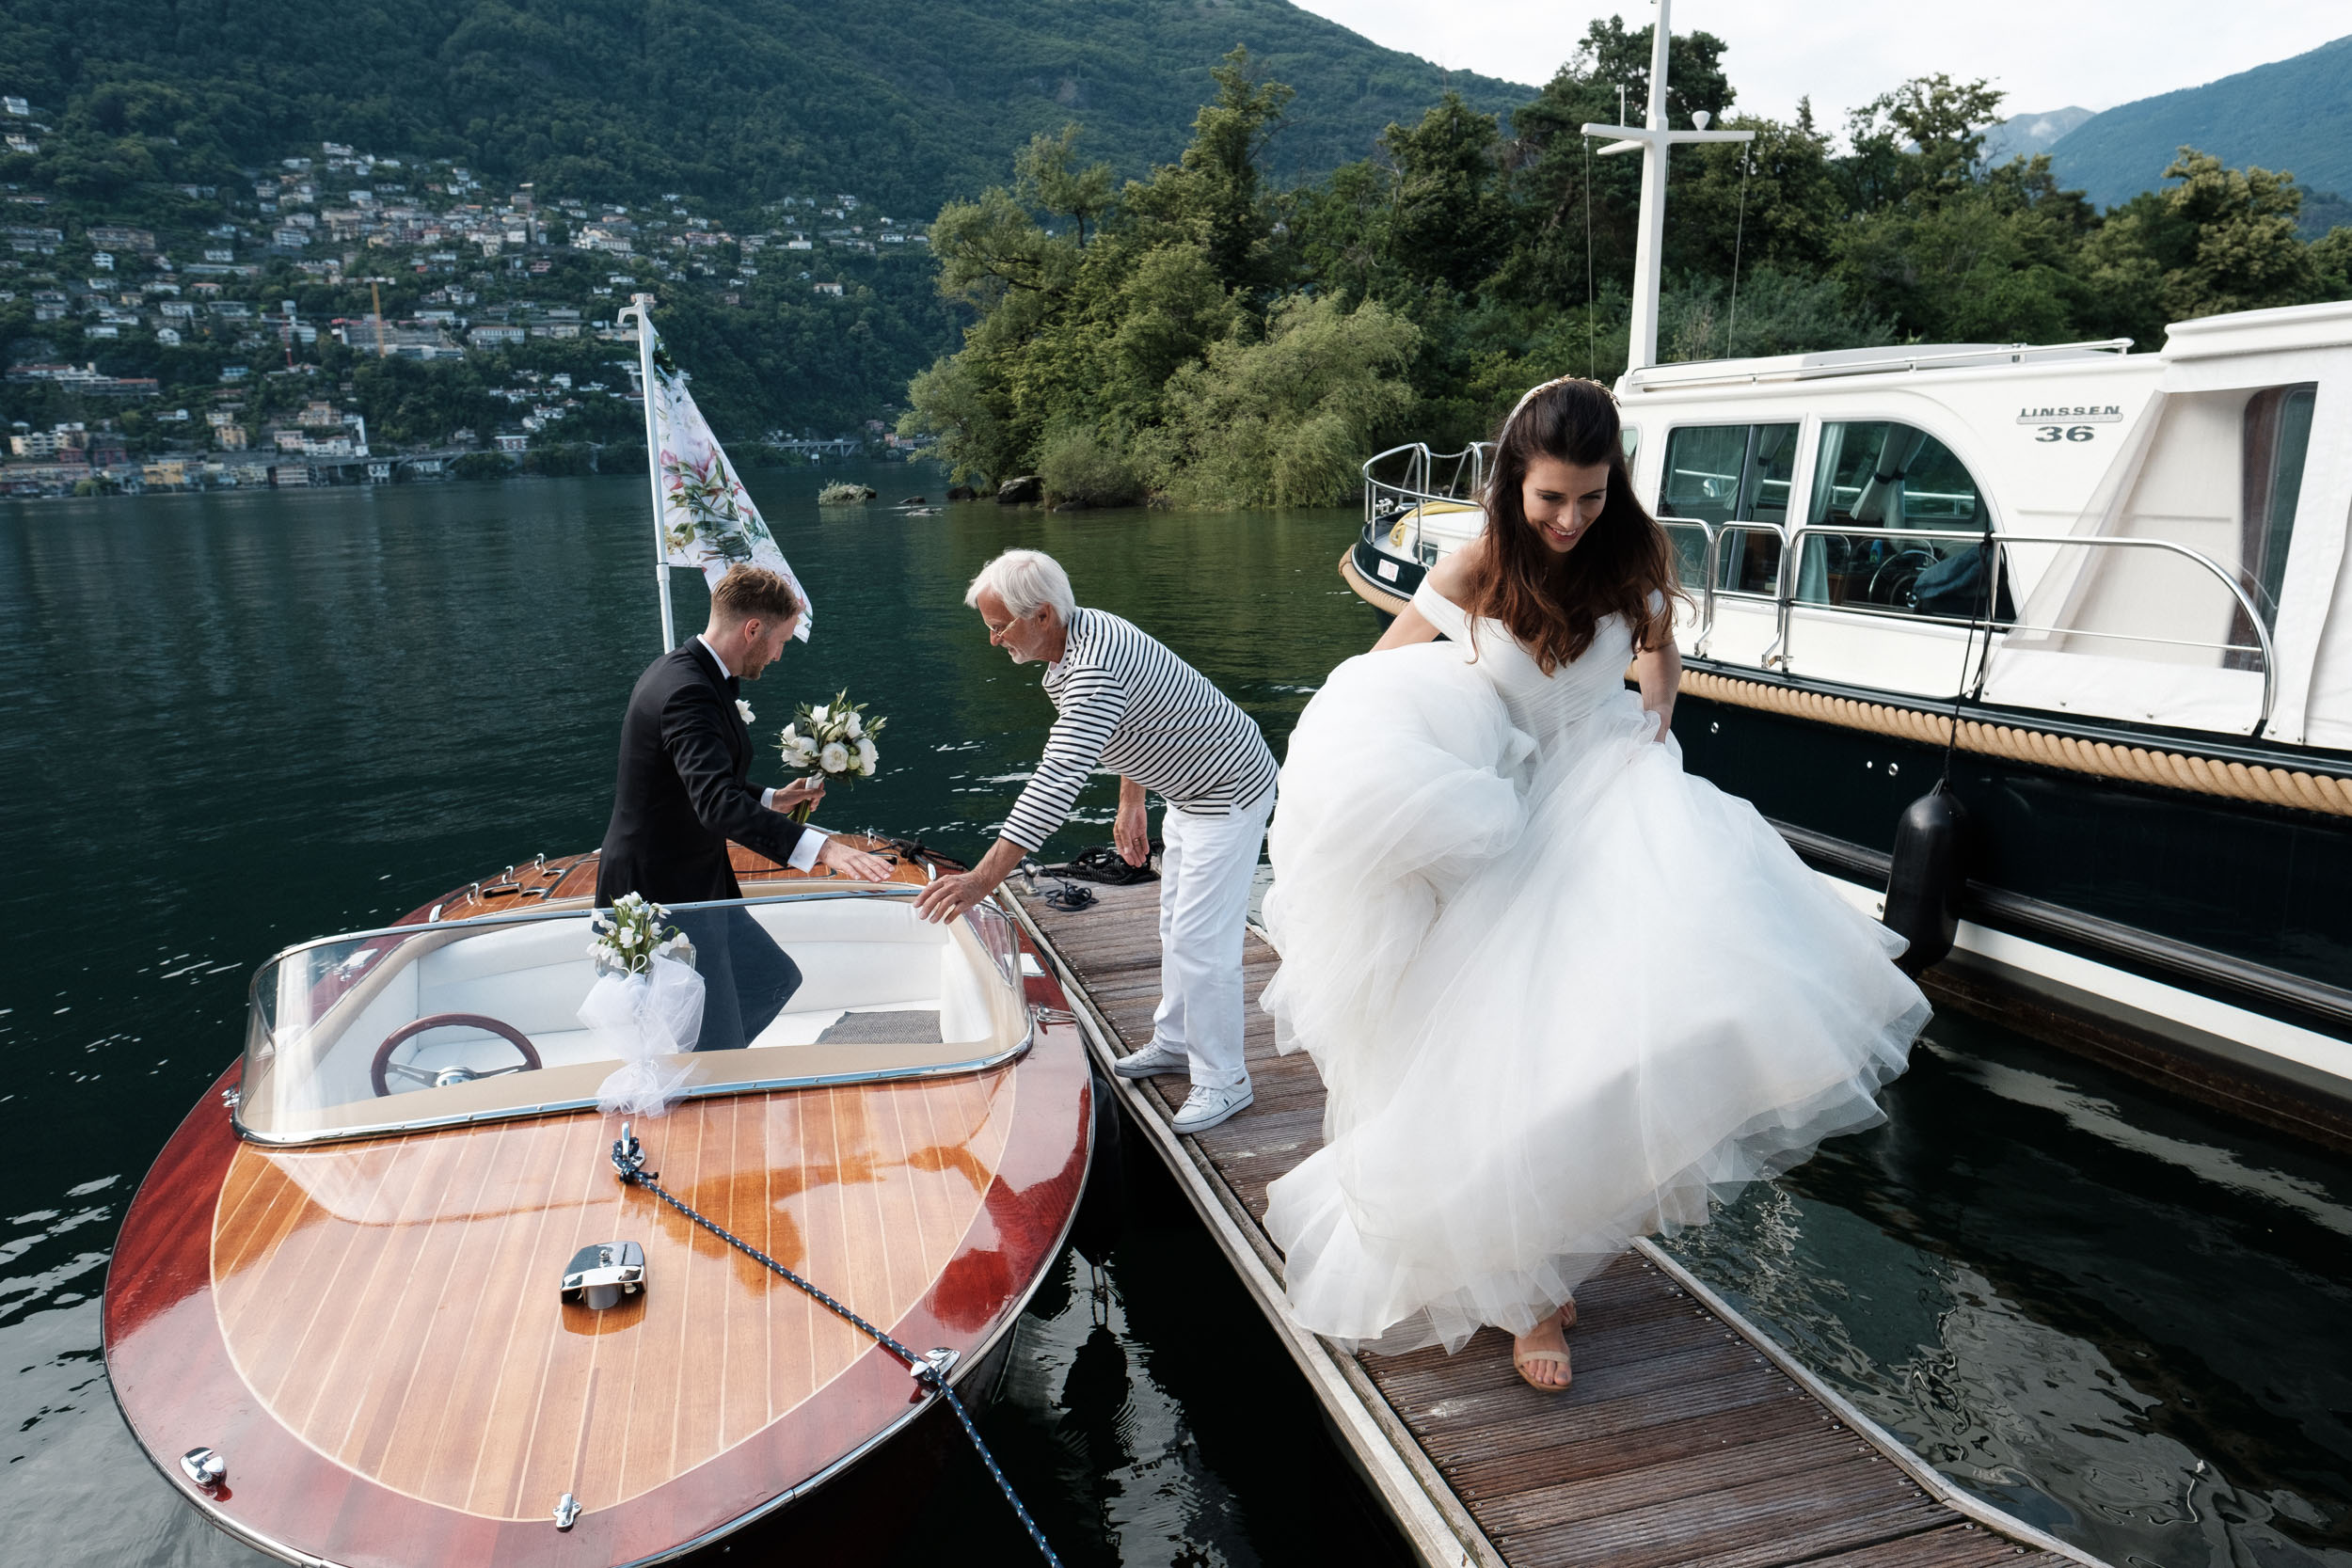 olivia-andreas-wedding-switzerland-378.jpg